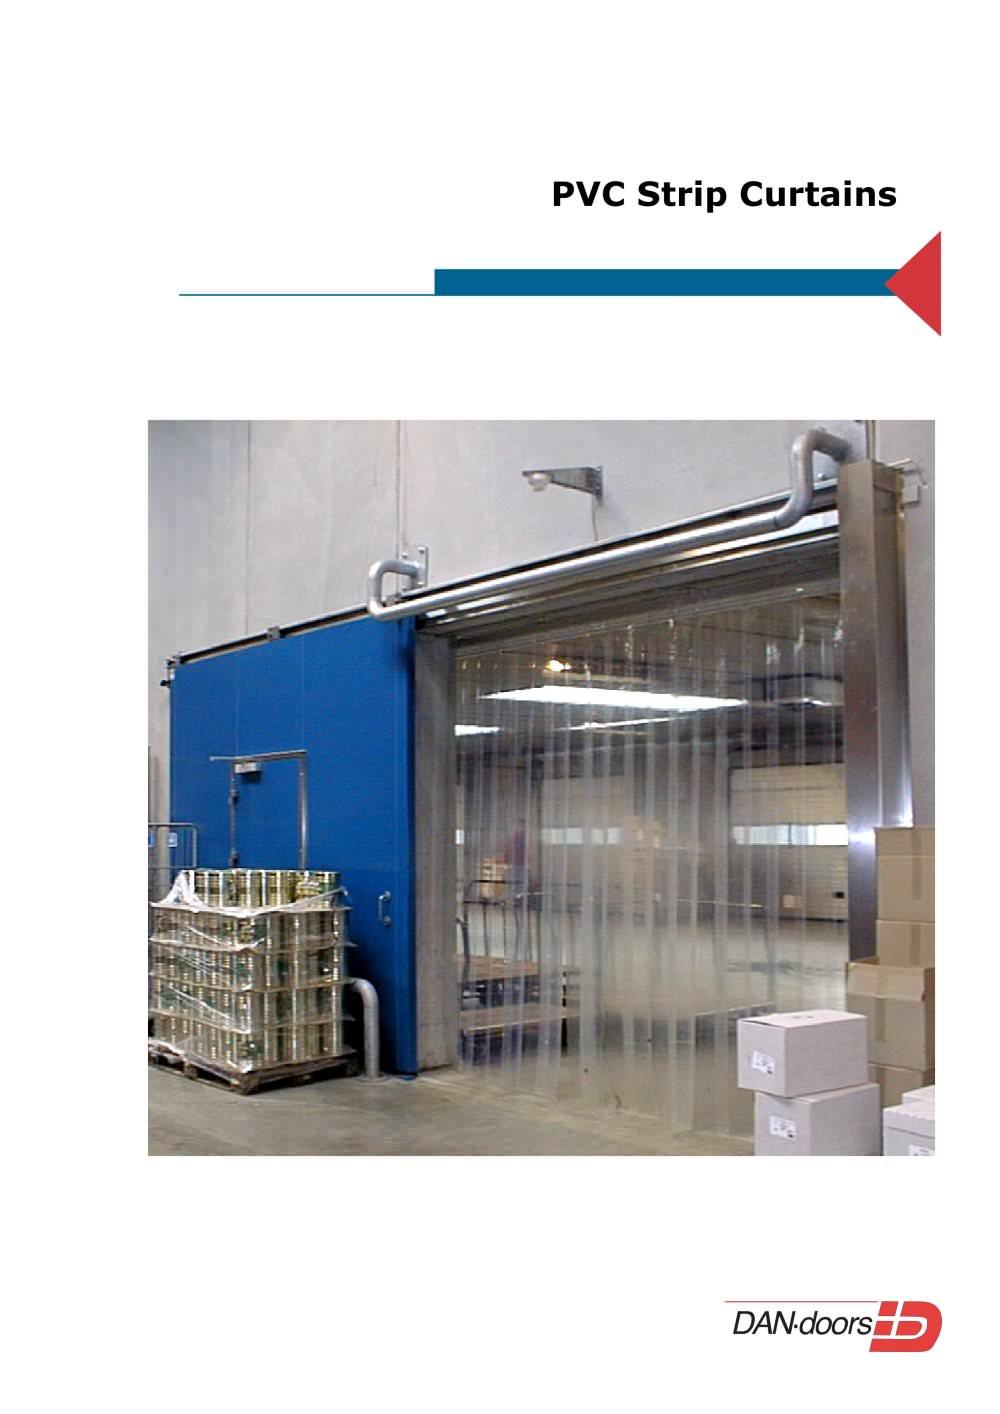 curtain standard uk arrow strip curtains ultra industrial doors clear pvc arrowstrip cropped